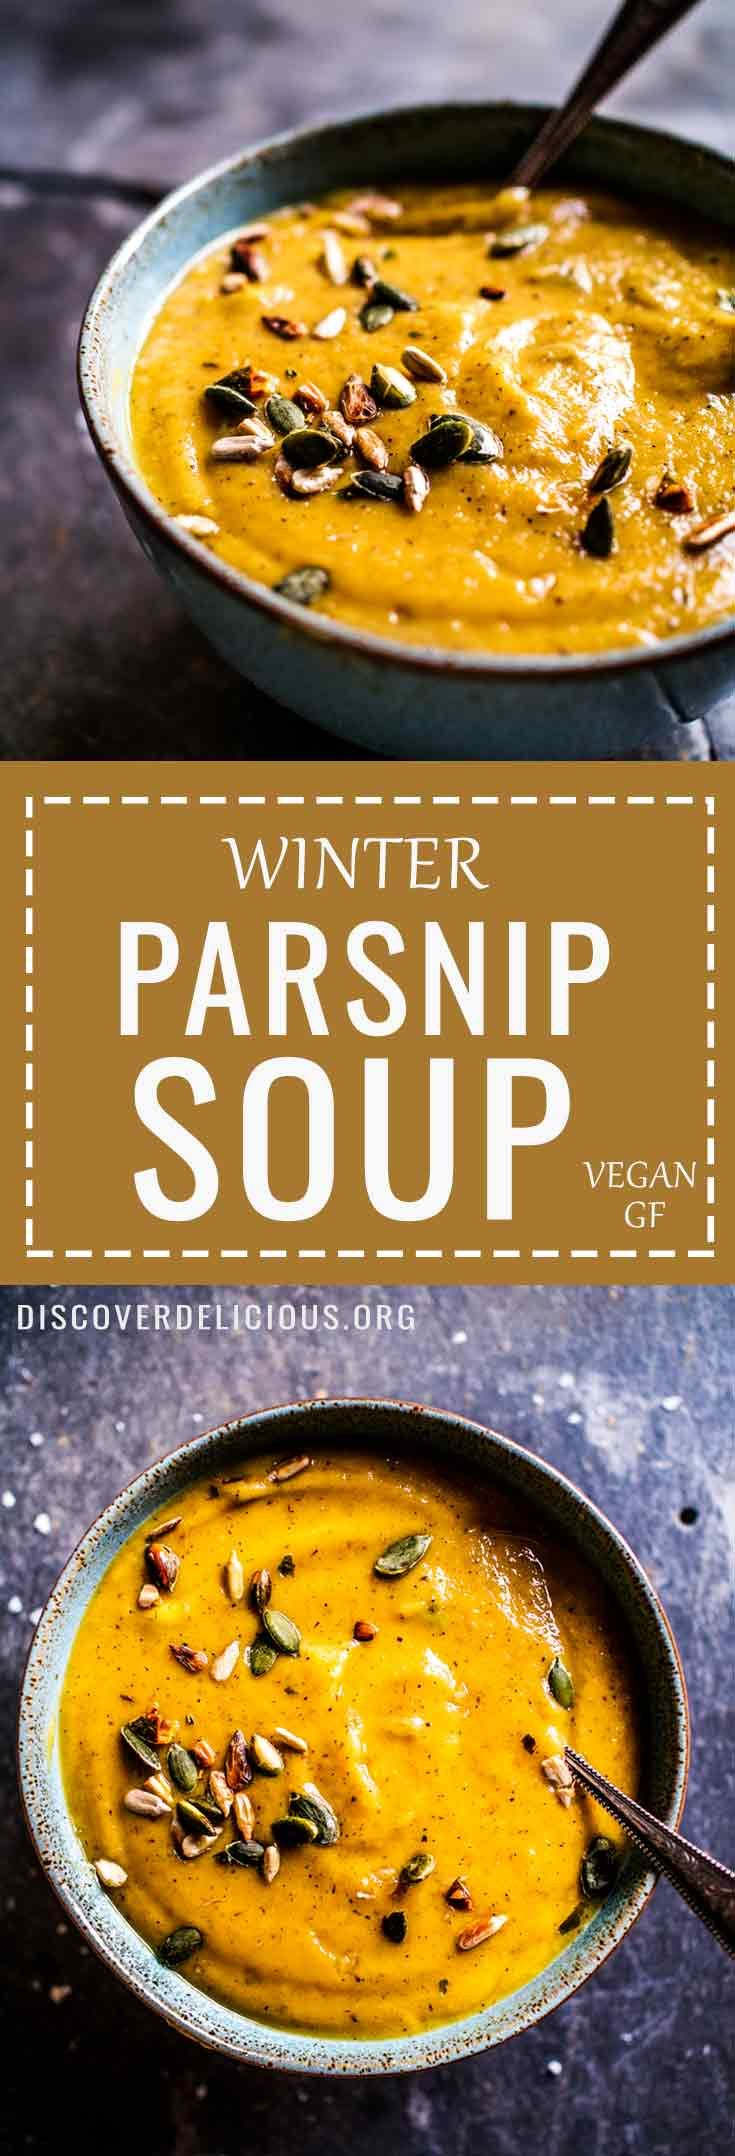 Creamy Winter Parsnip Soup Recipe w/ toasted pumpkin & sunflower seeds. Vegan + GF too! #vegan #creamy #simple #dairyfree #leek #winter # #recipe #recipes #healthy #easy #gluten #free